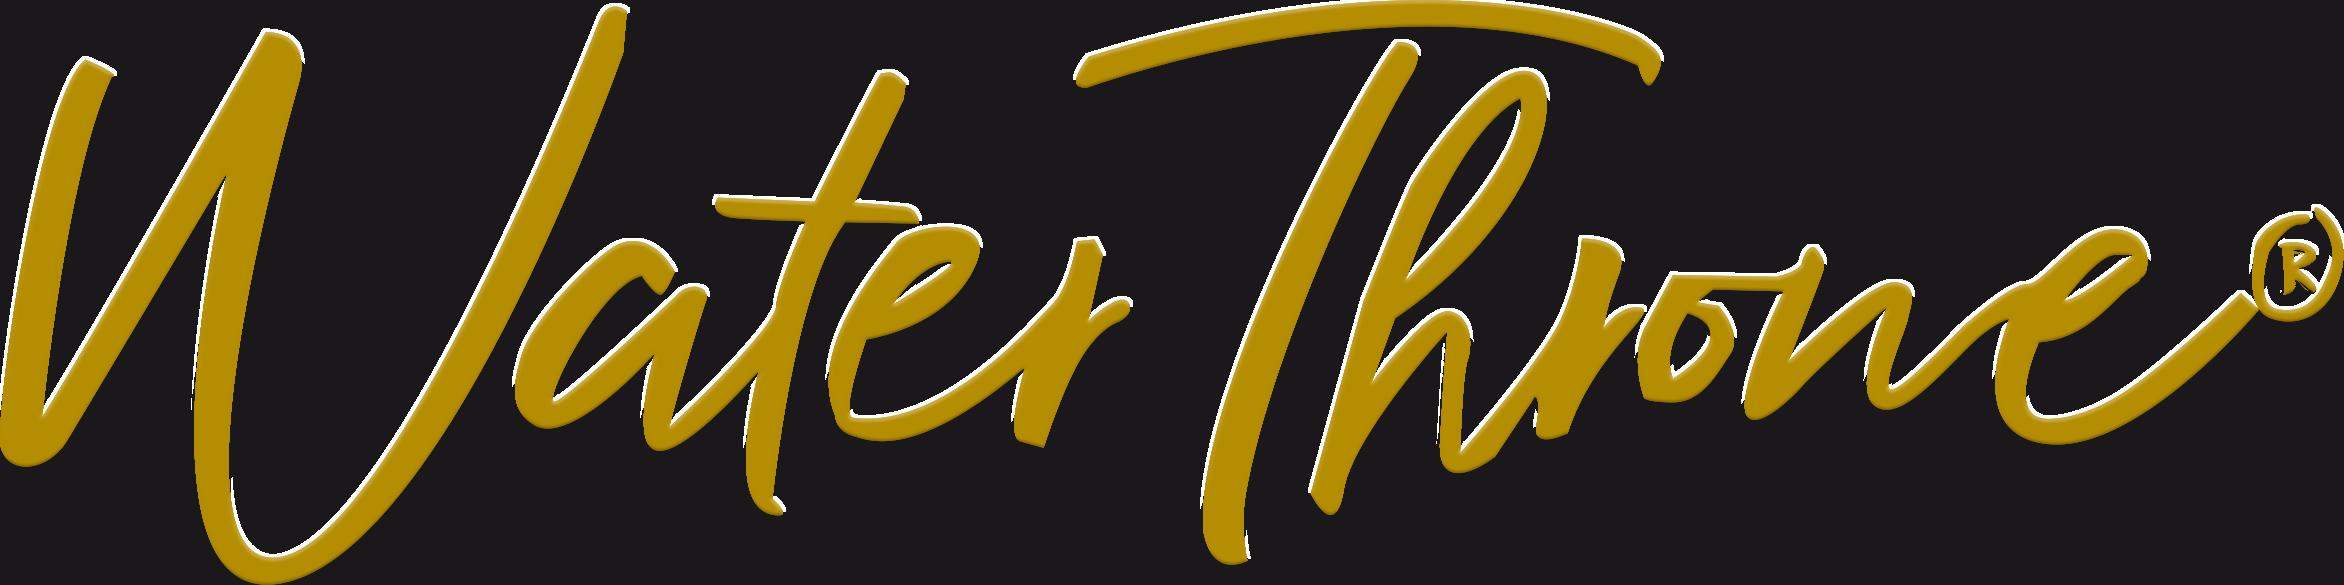 water throne logo